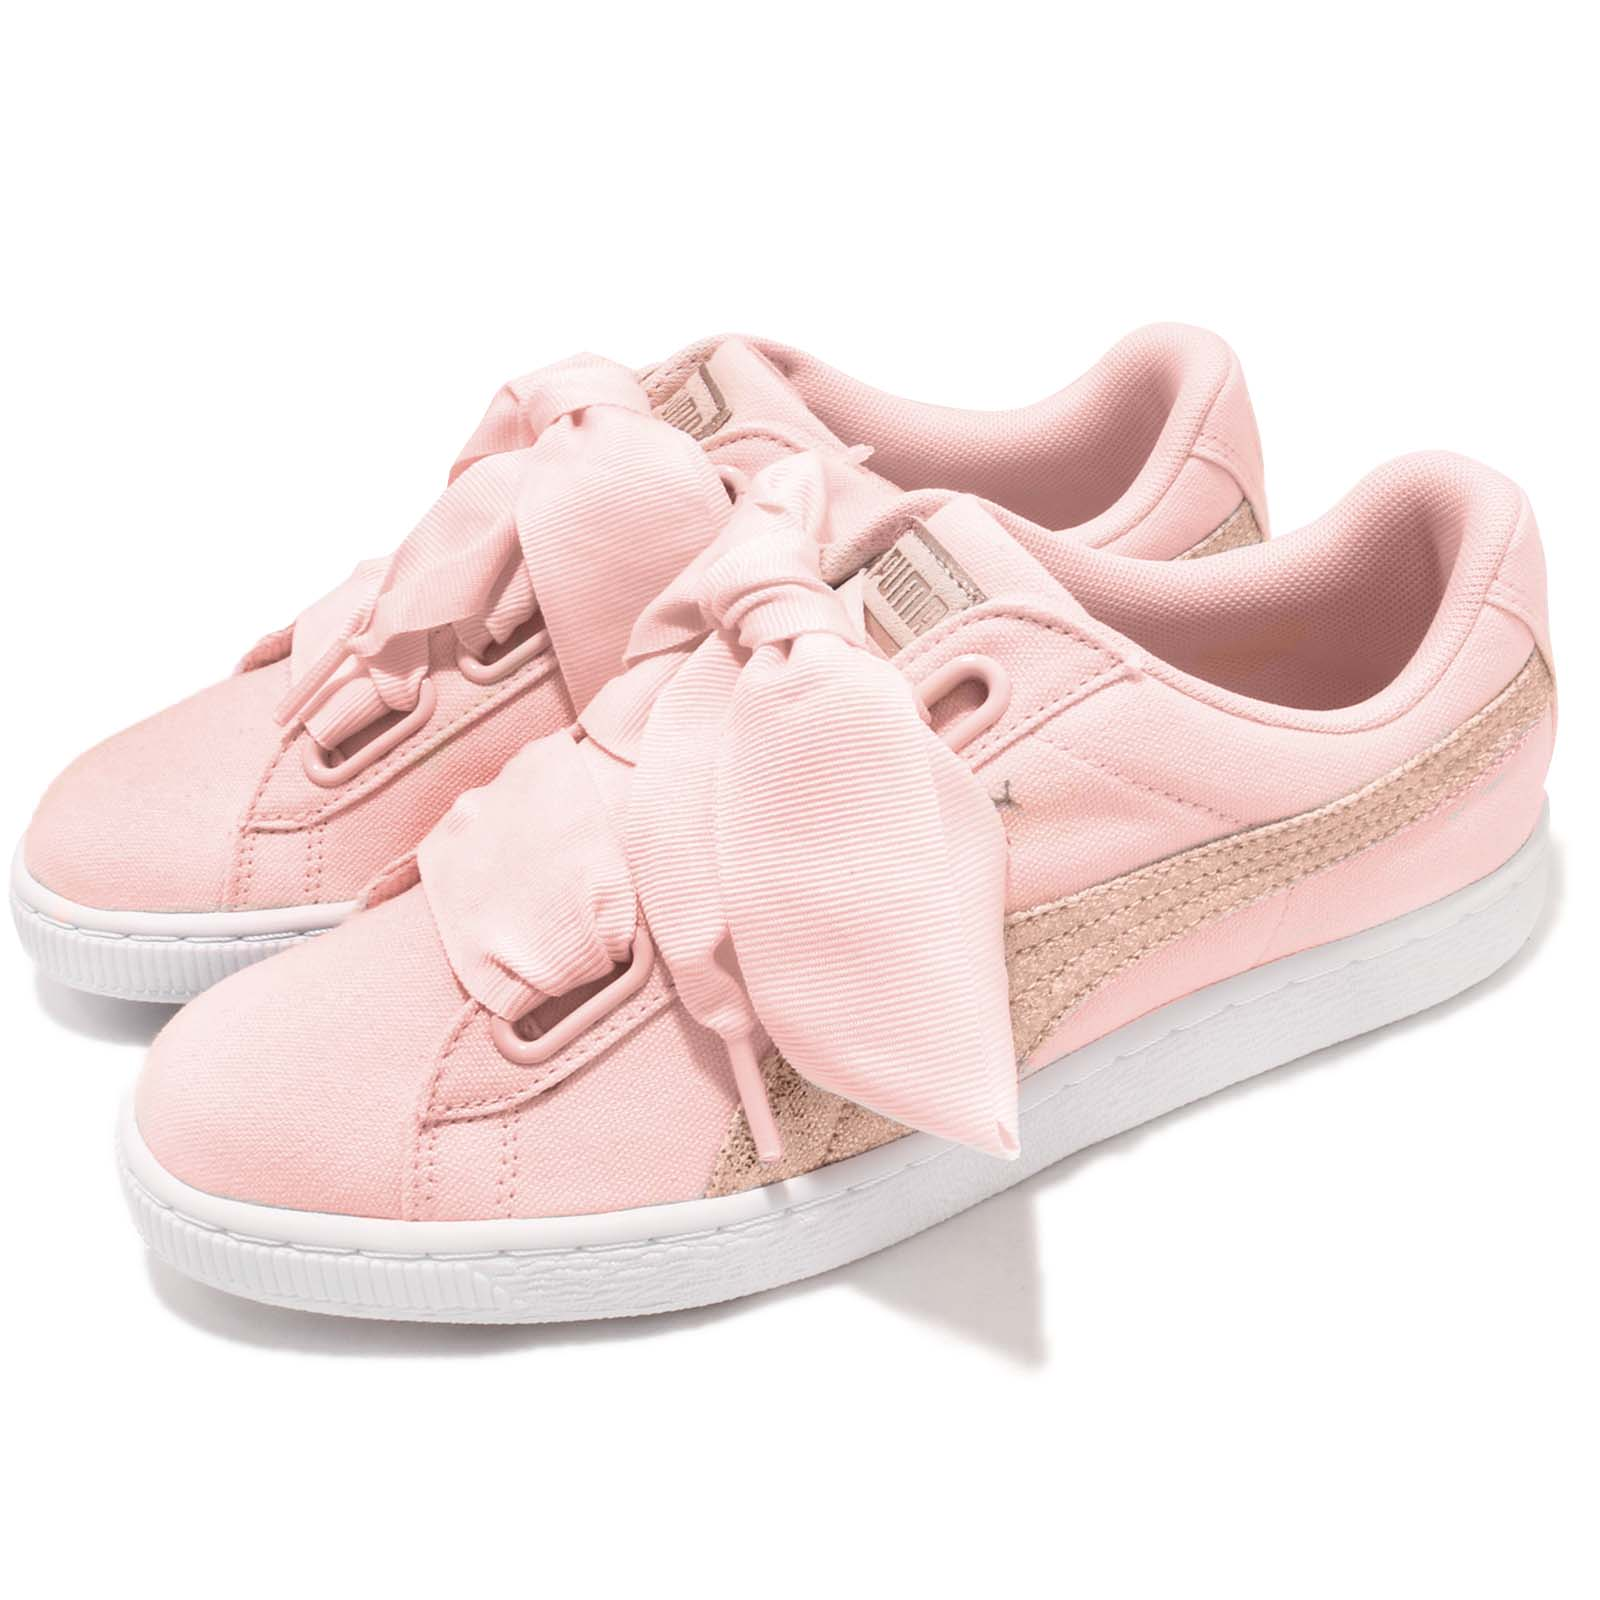 Puma 休閒鞋 Basket Heart 女鞋 36649502